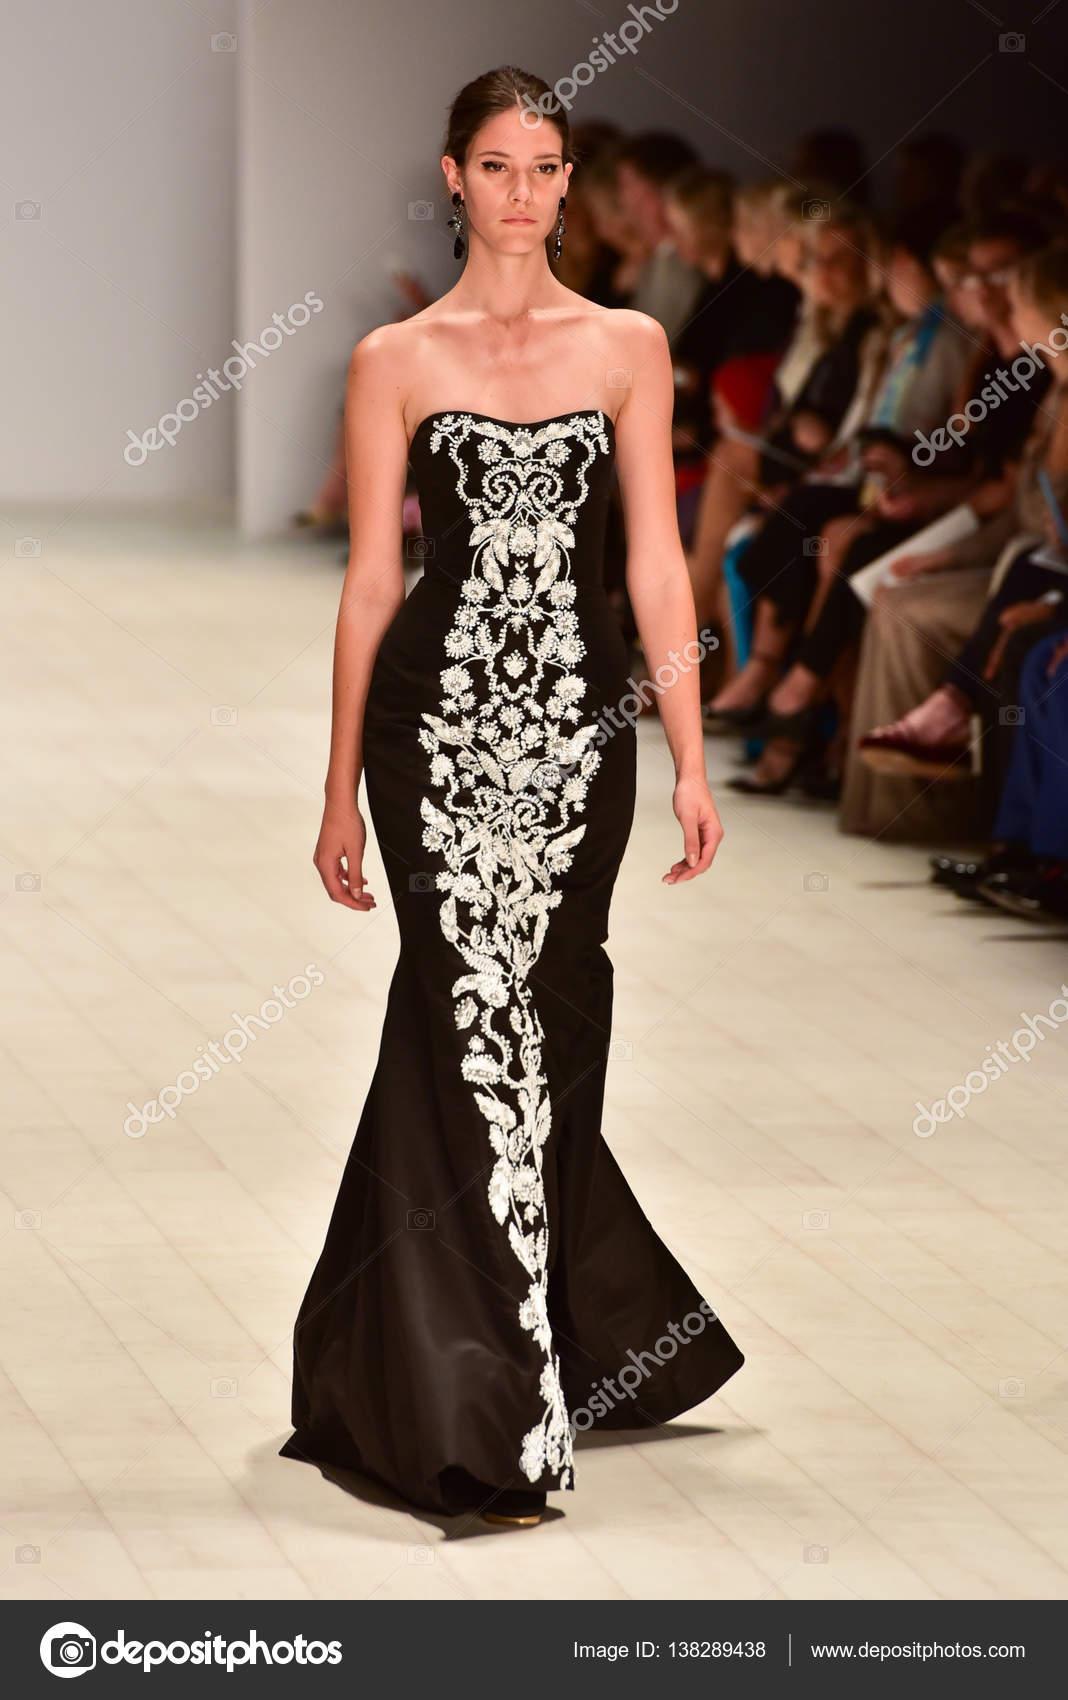 39acd1cbedd Oscar de la Renta fashion show – Stock Editorial Photo © mariematata ...